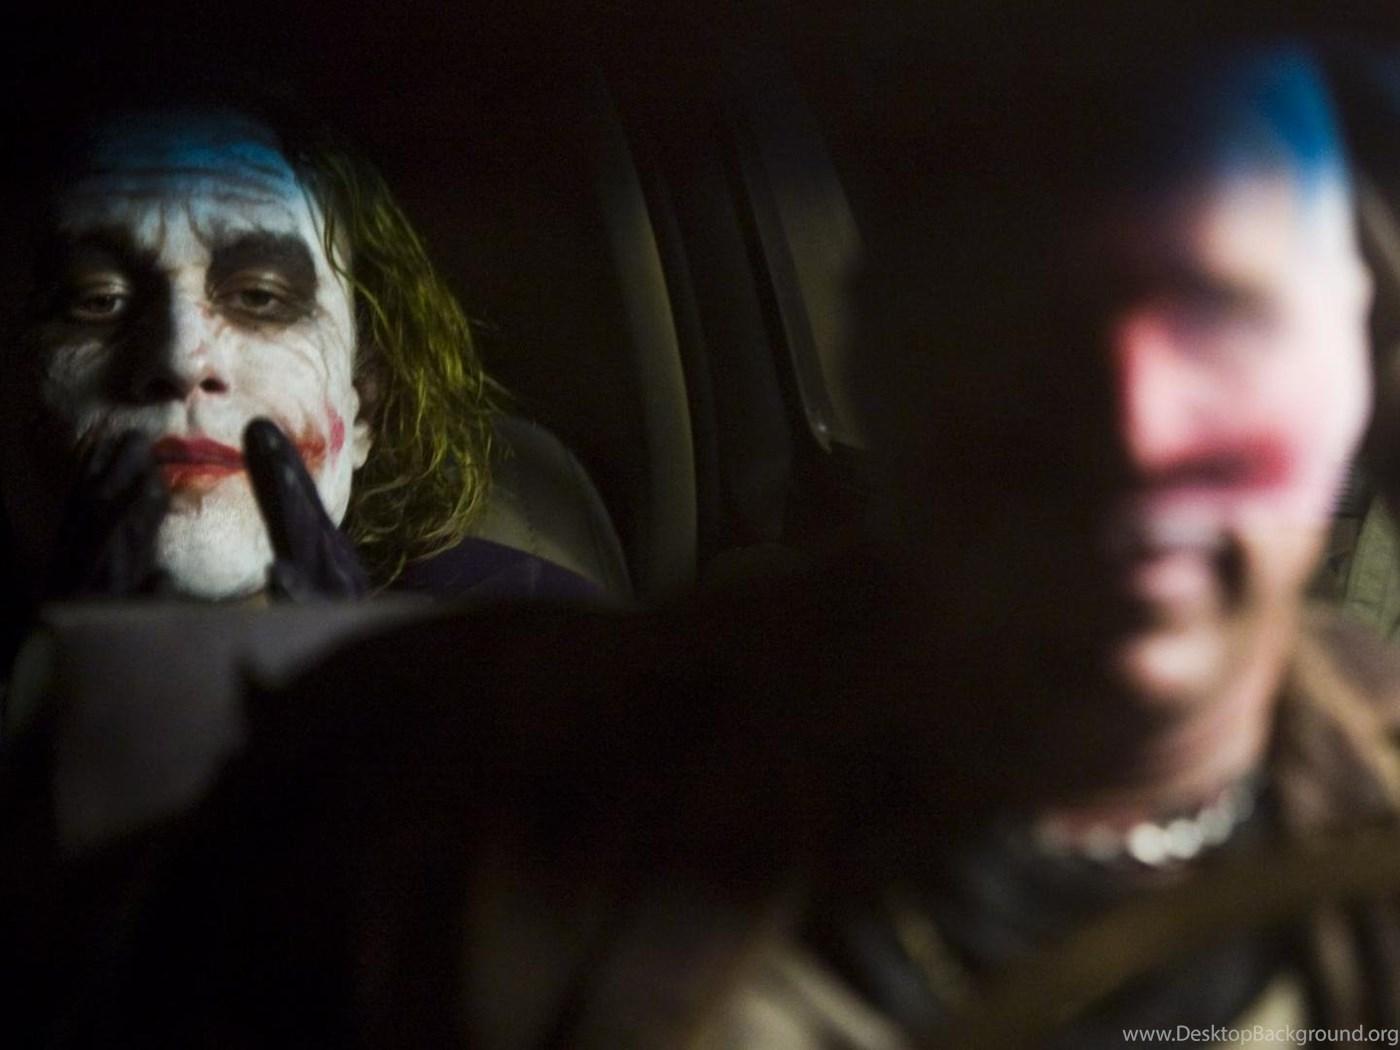 Movies Dark Knight The Joker Heath Ledger Movie Hd Wallpapers Desktop Background